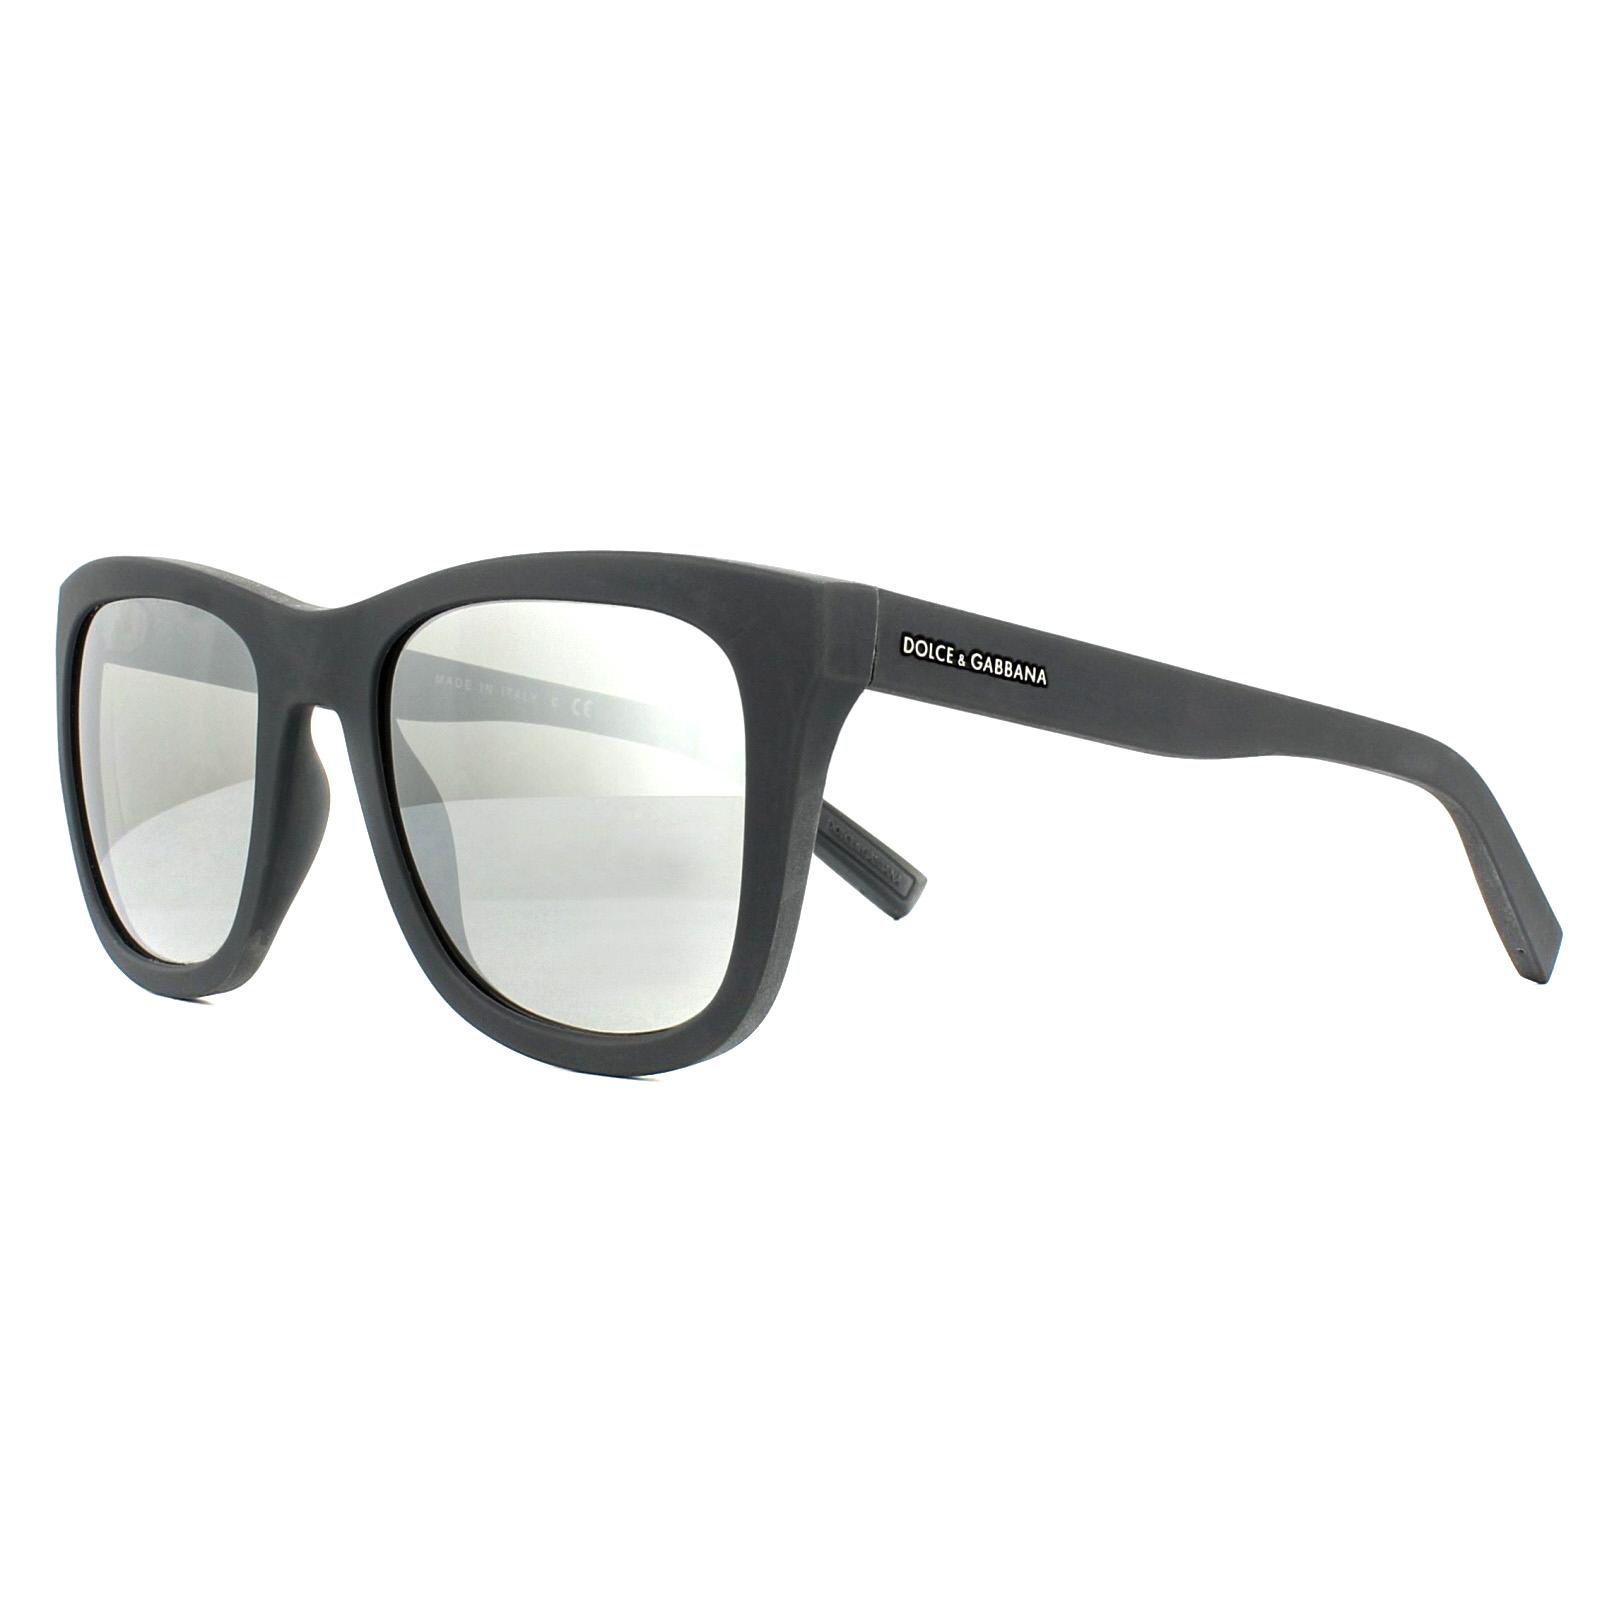 853d6c20f1ff Sentinel Dolce   Gabbana Sunglasses 2145 12676G Grey Rubber Light Grey  Silver Mirror